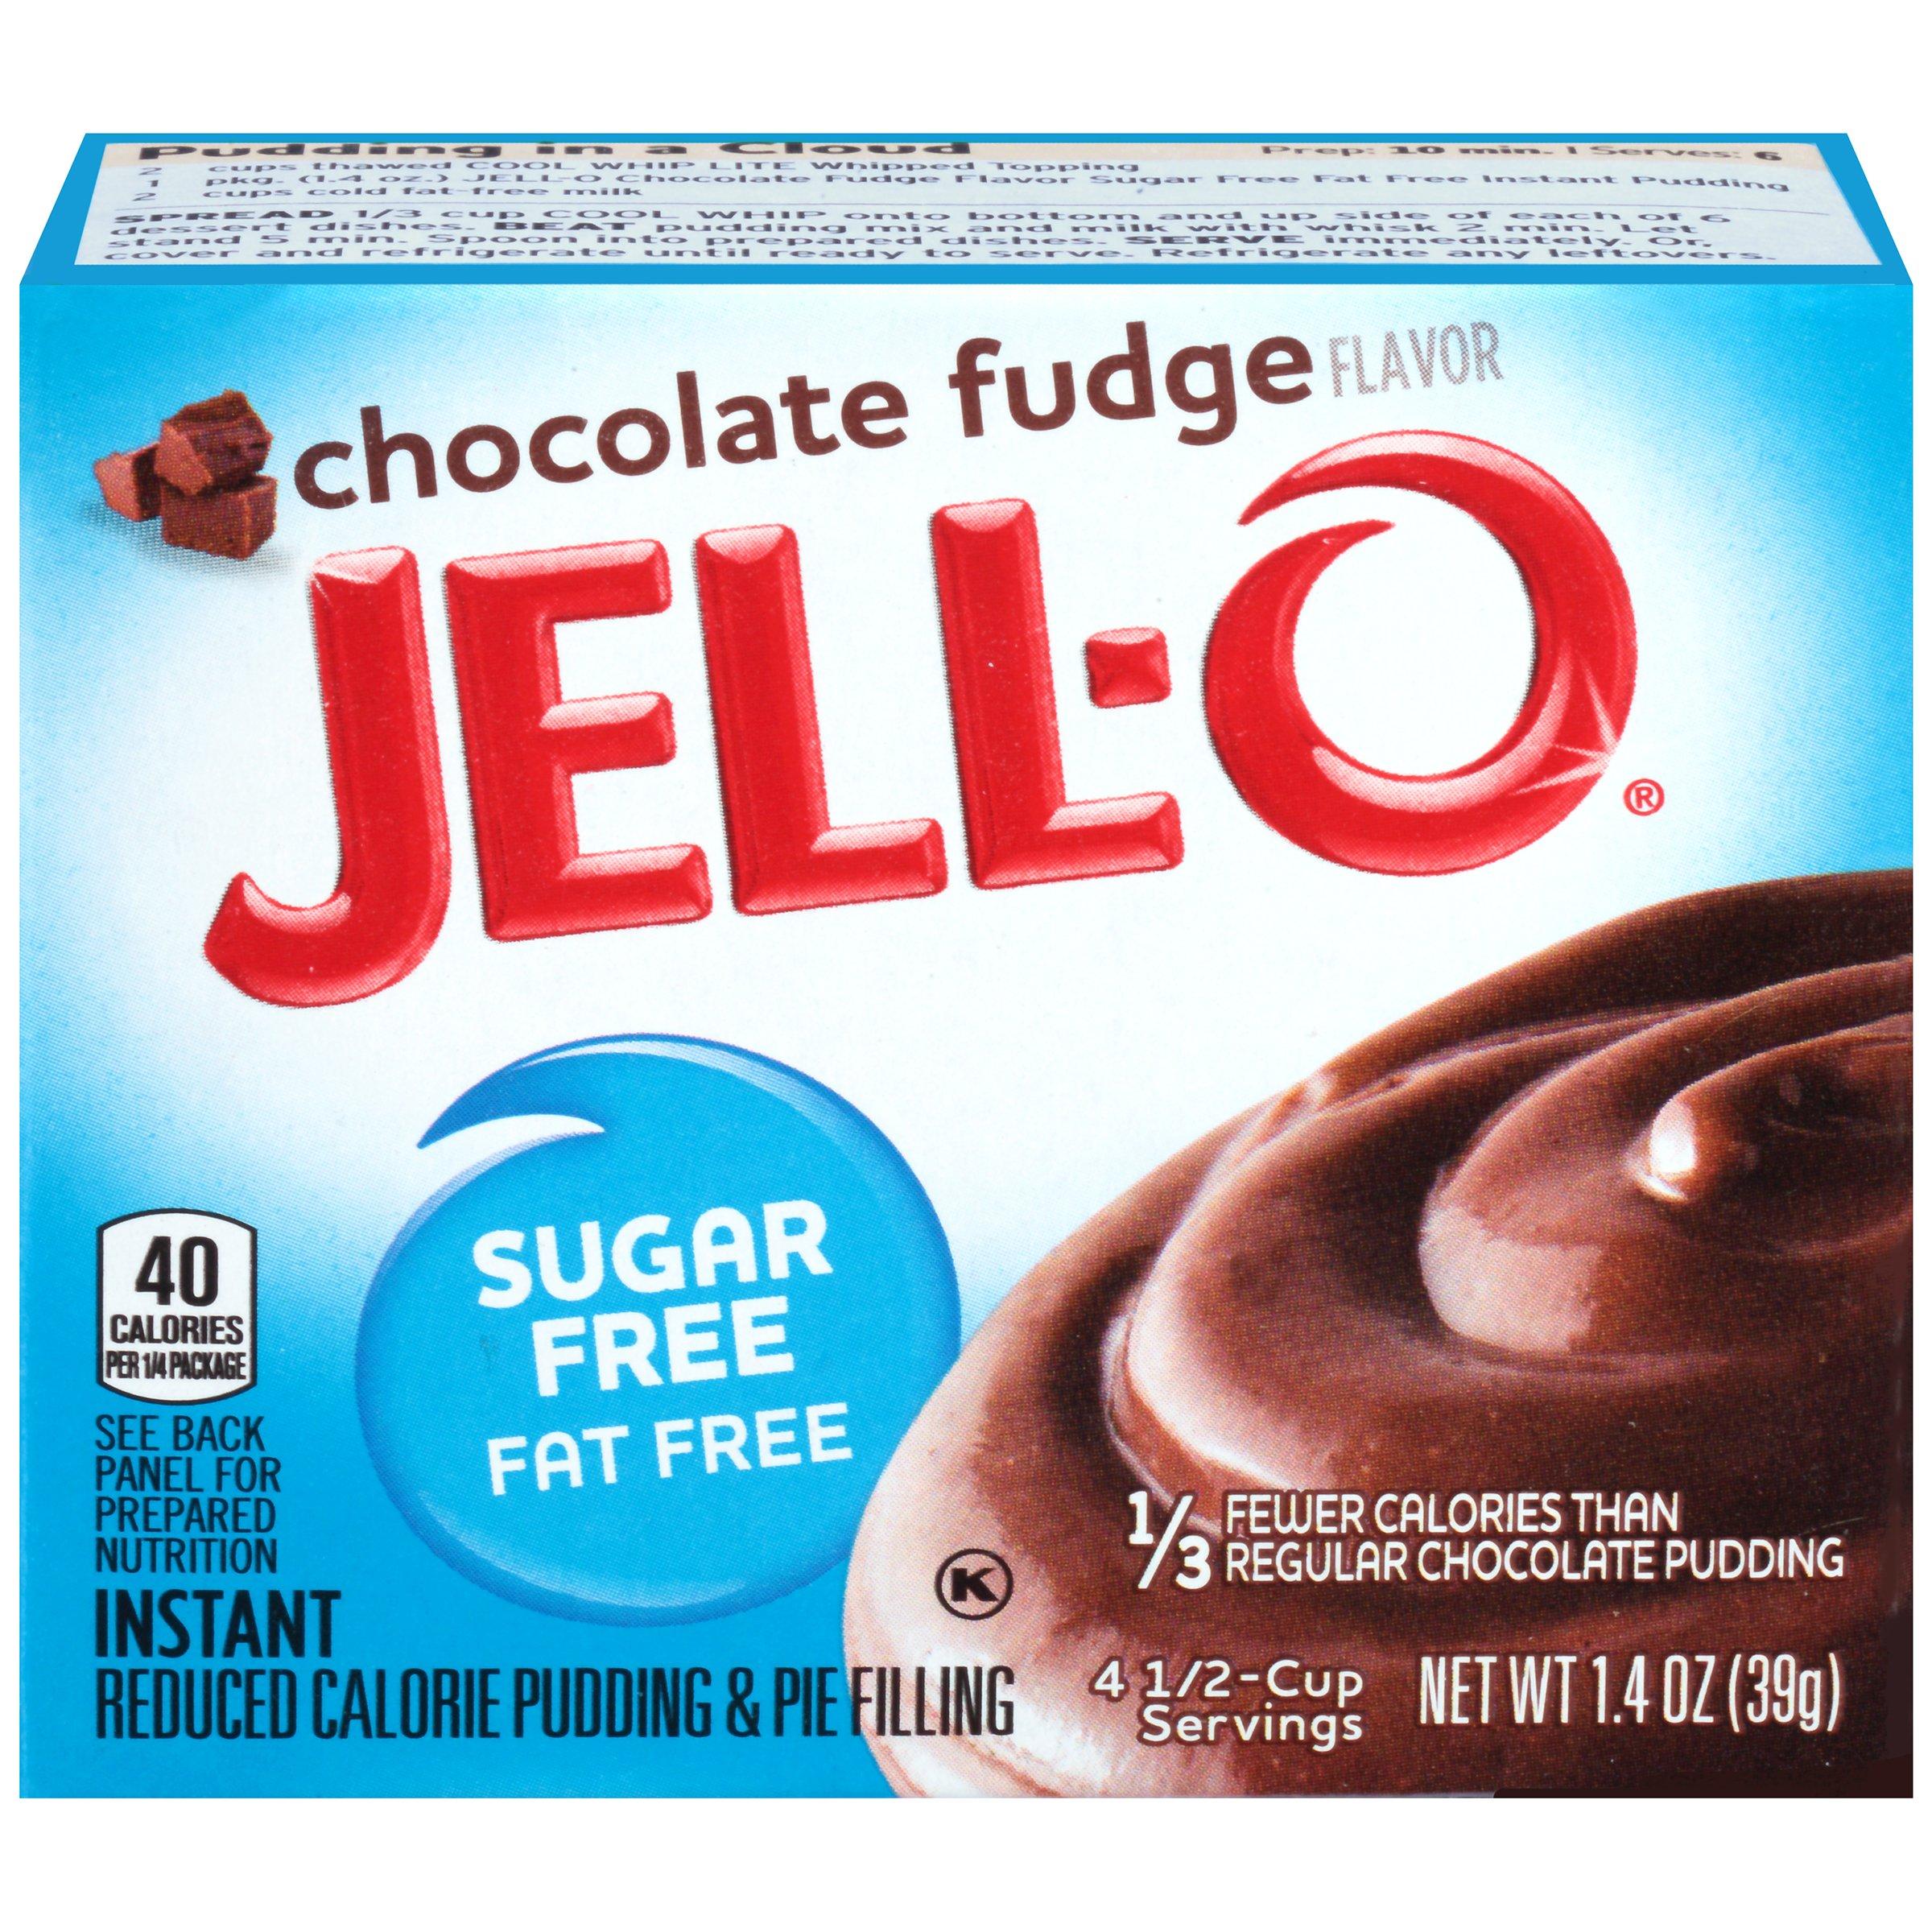 Jell-O Instant Sugar-Free Fat-Free Chocolate Fudge Pudding & Pie Filling, 1.4 oz Box